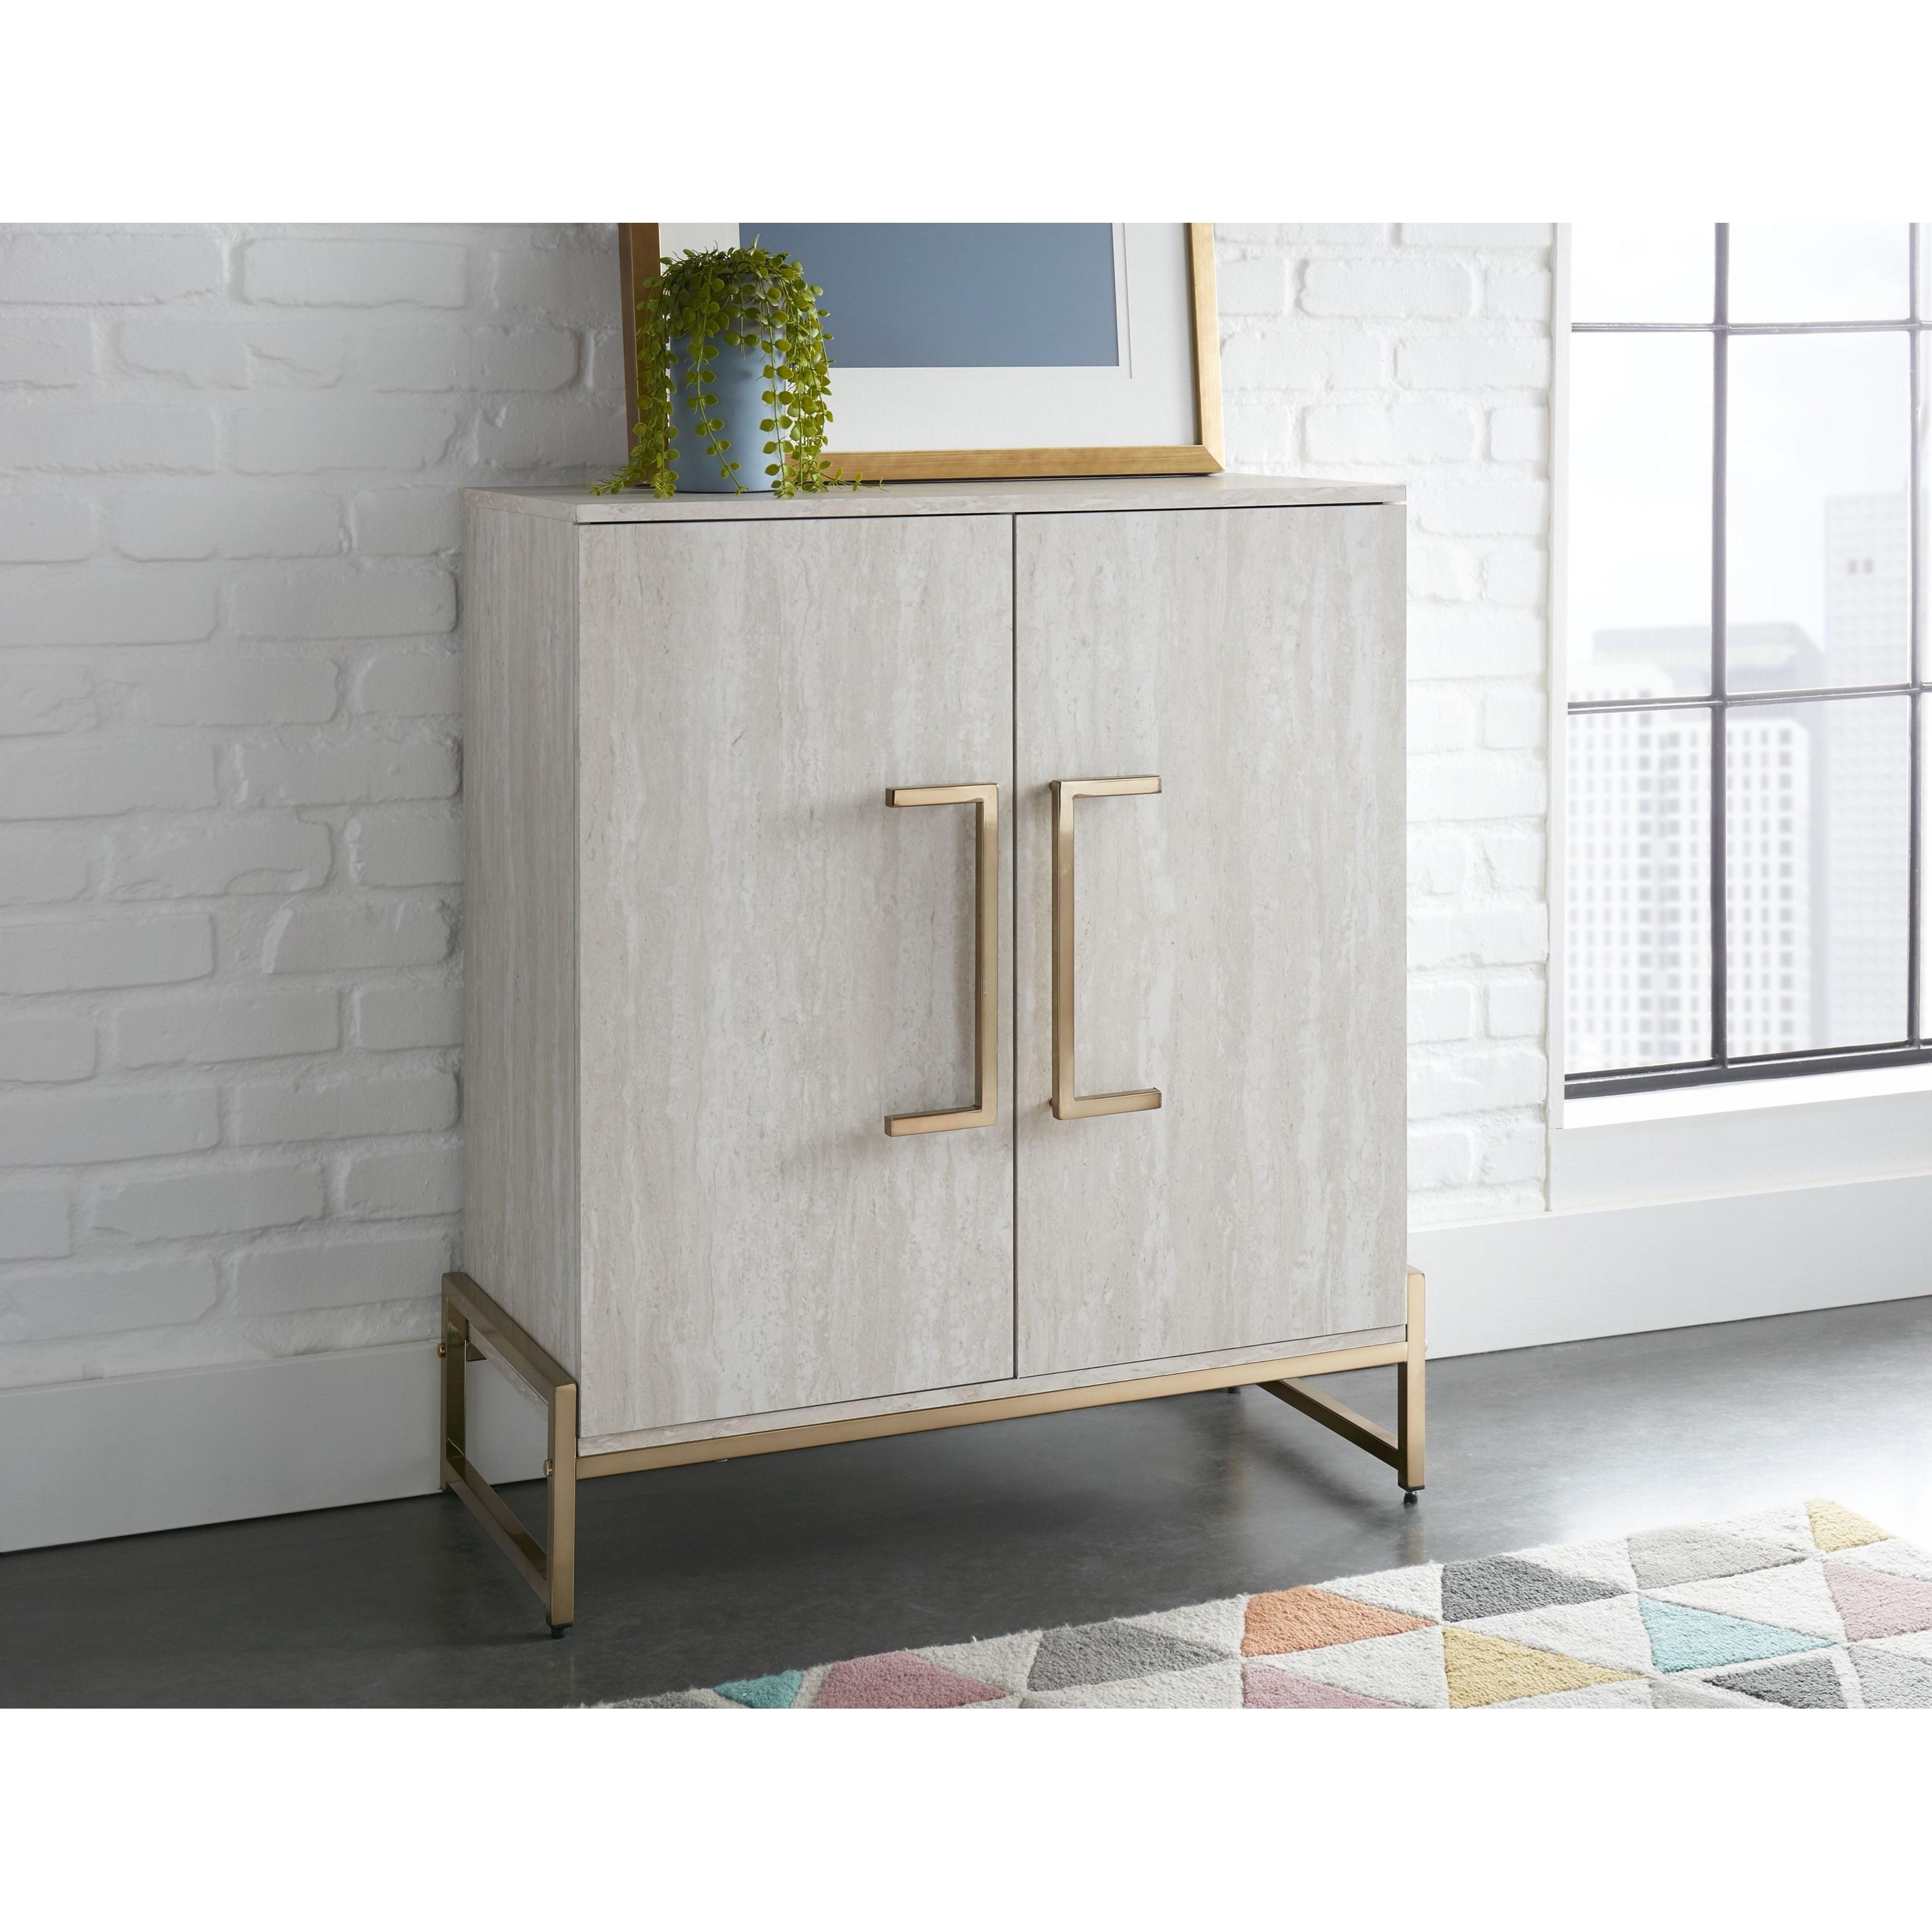 Larkin Faux Marble Wine Cabinet by Steve Silver at Standard Furniture